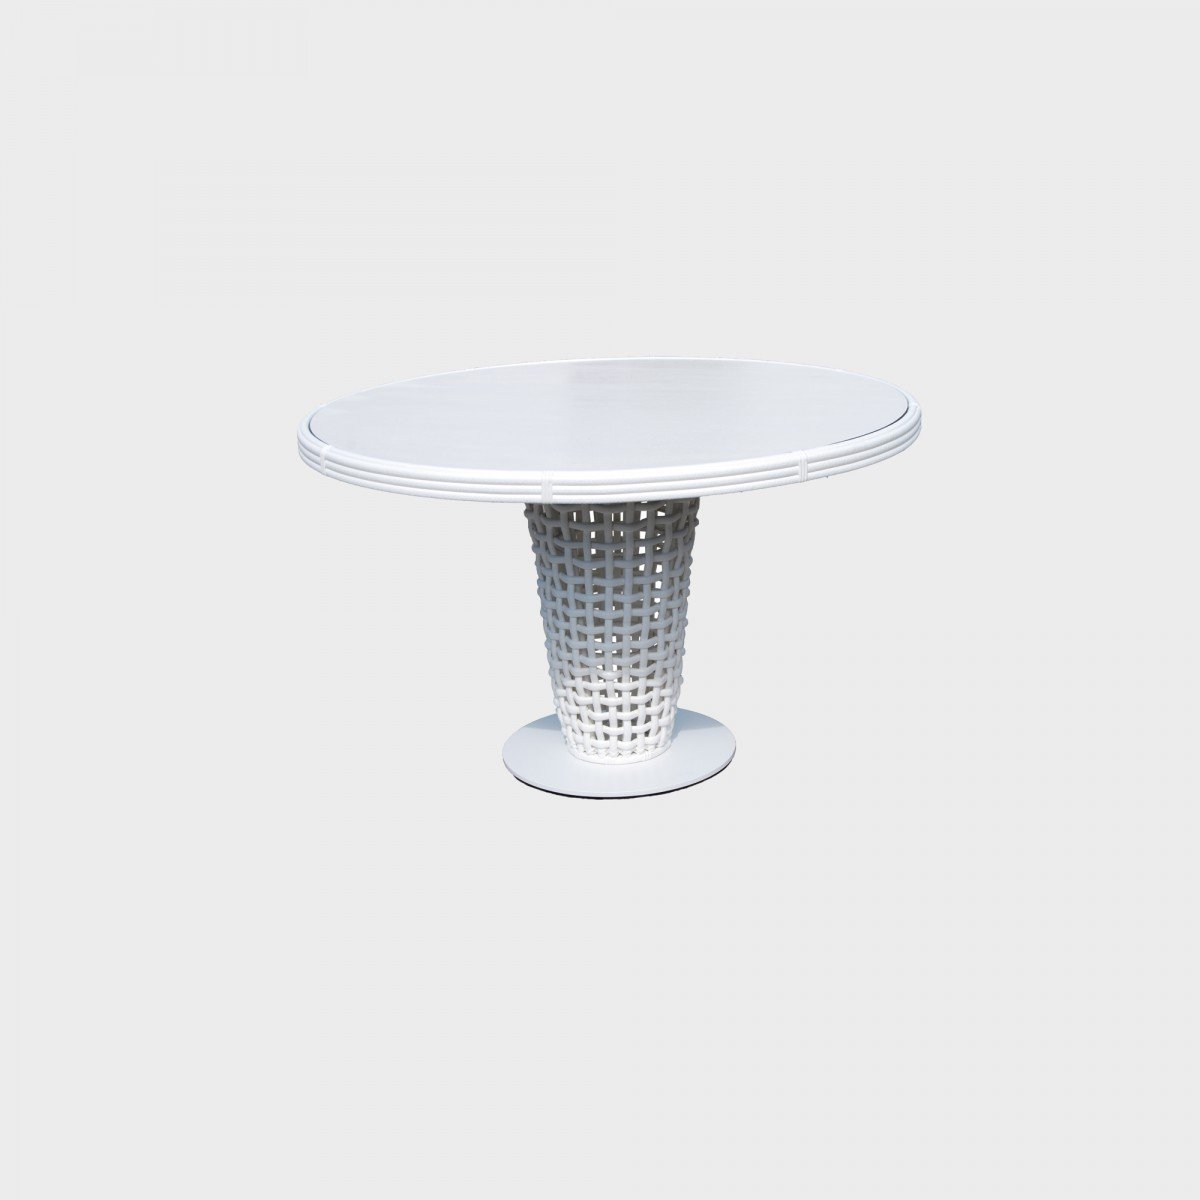 Tavoli Da Pranzo Rotondi In Vetro.Tavolo Da Pranzo Rotondo 120 Cm H 75 Cm 120cm 64 64kg 0